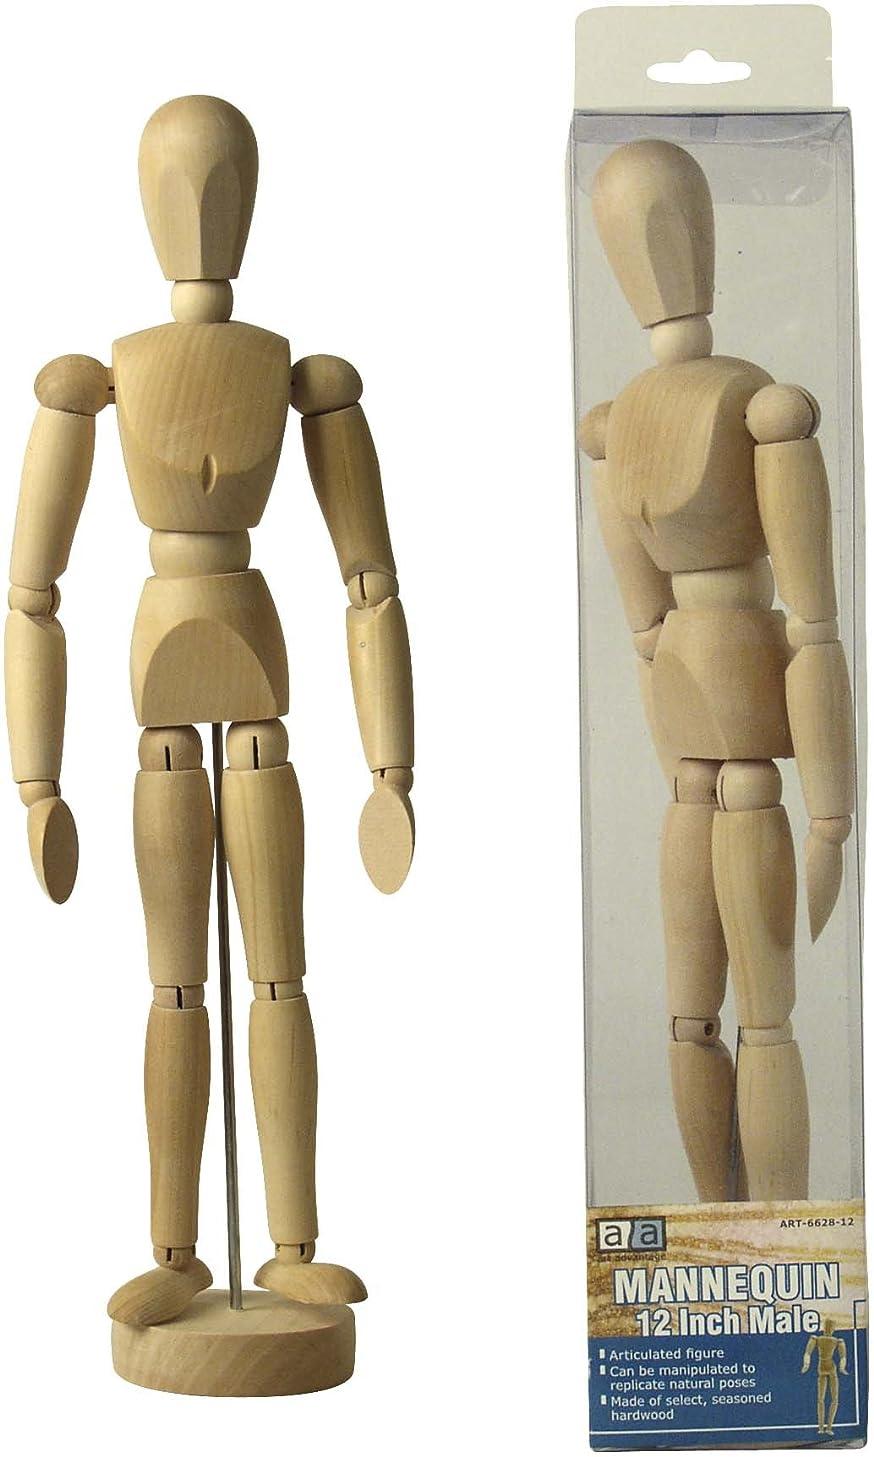 Art Advantage 12-Inch Male Mannequin